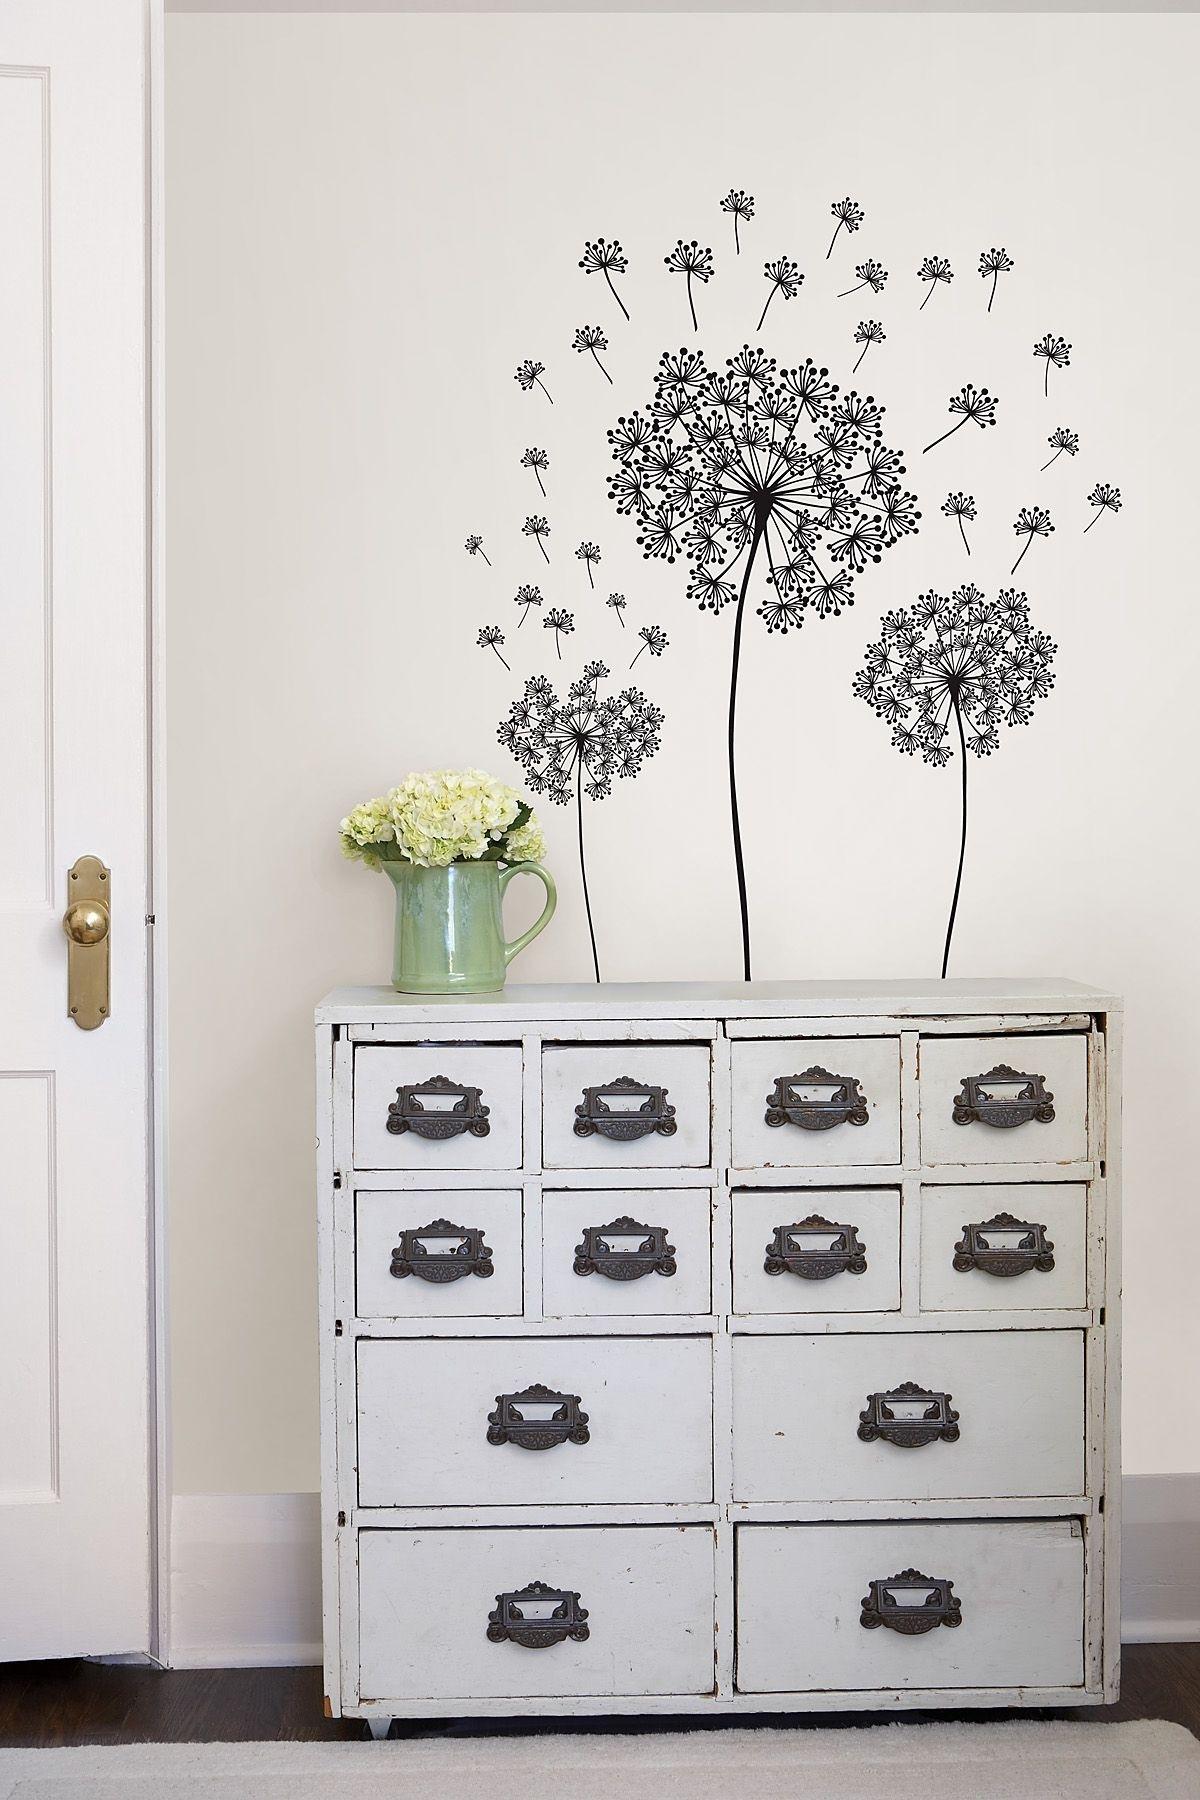 Dandelion Wall Art Sticker Kit Pertaining To Recent Dandelion Wall Art (View 8 of 20)